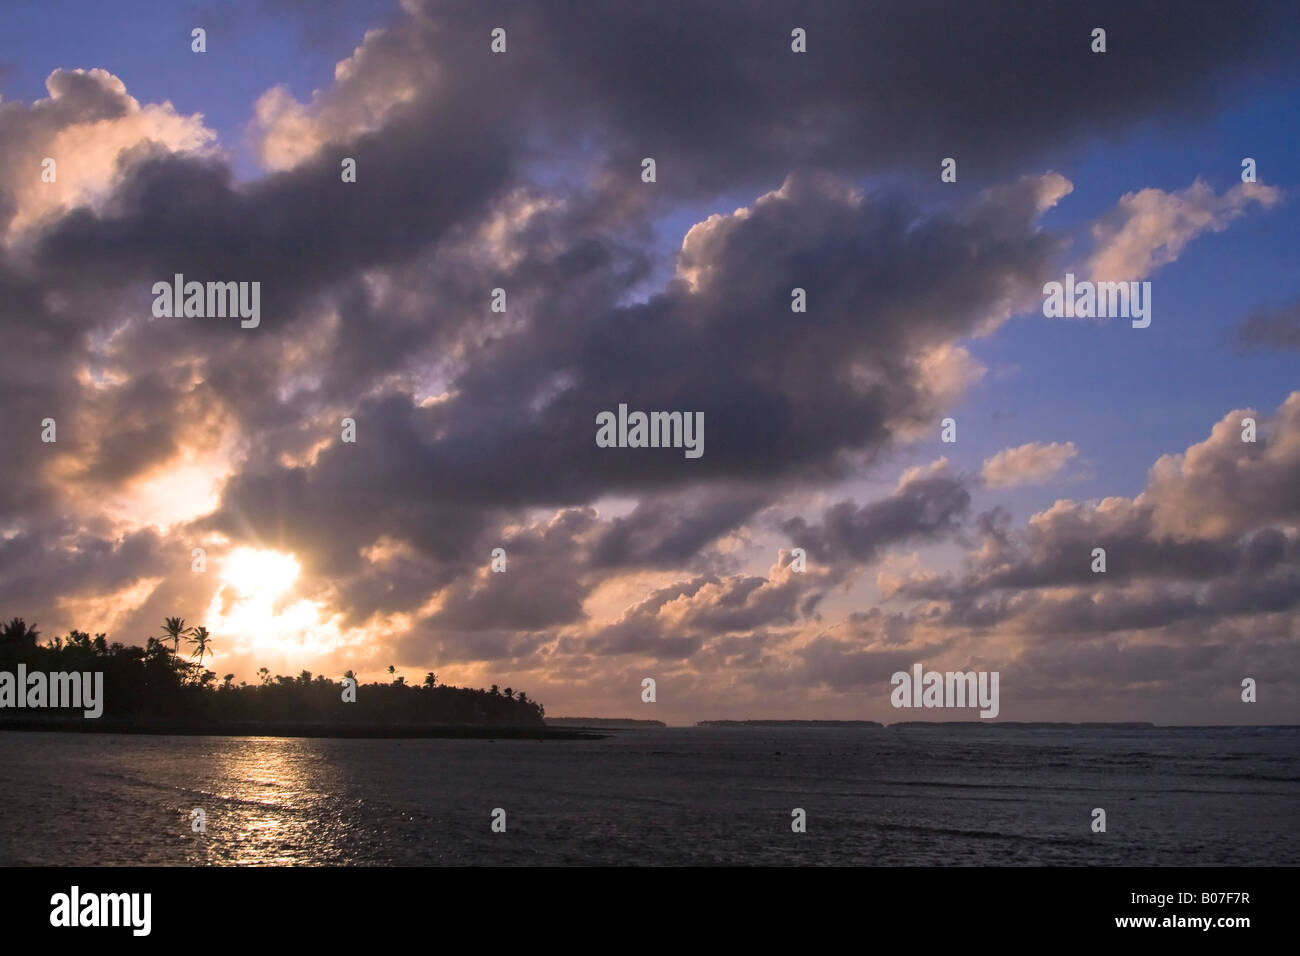 Landscape at sunset, Majuro Atoll, Marshall Islands - Stock Image